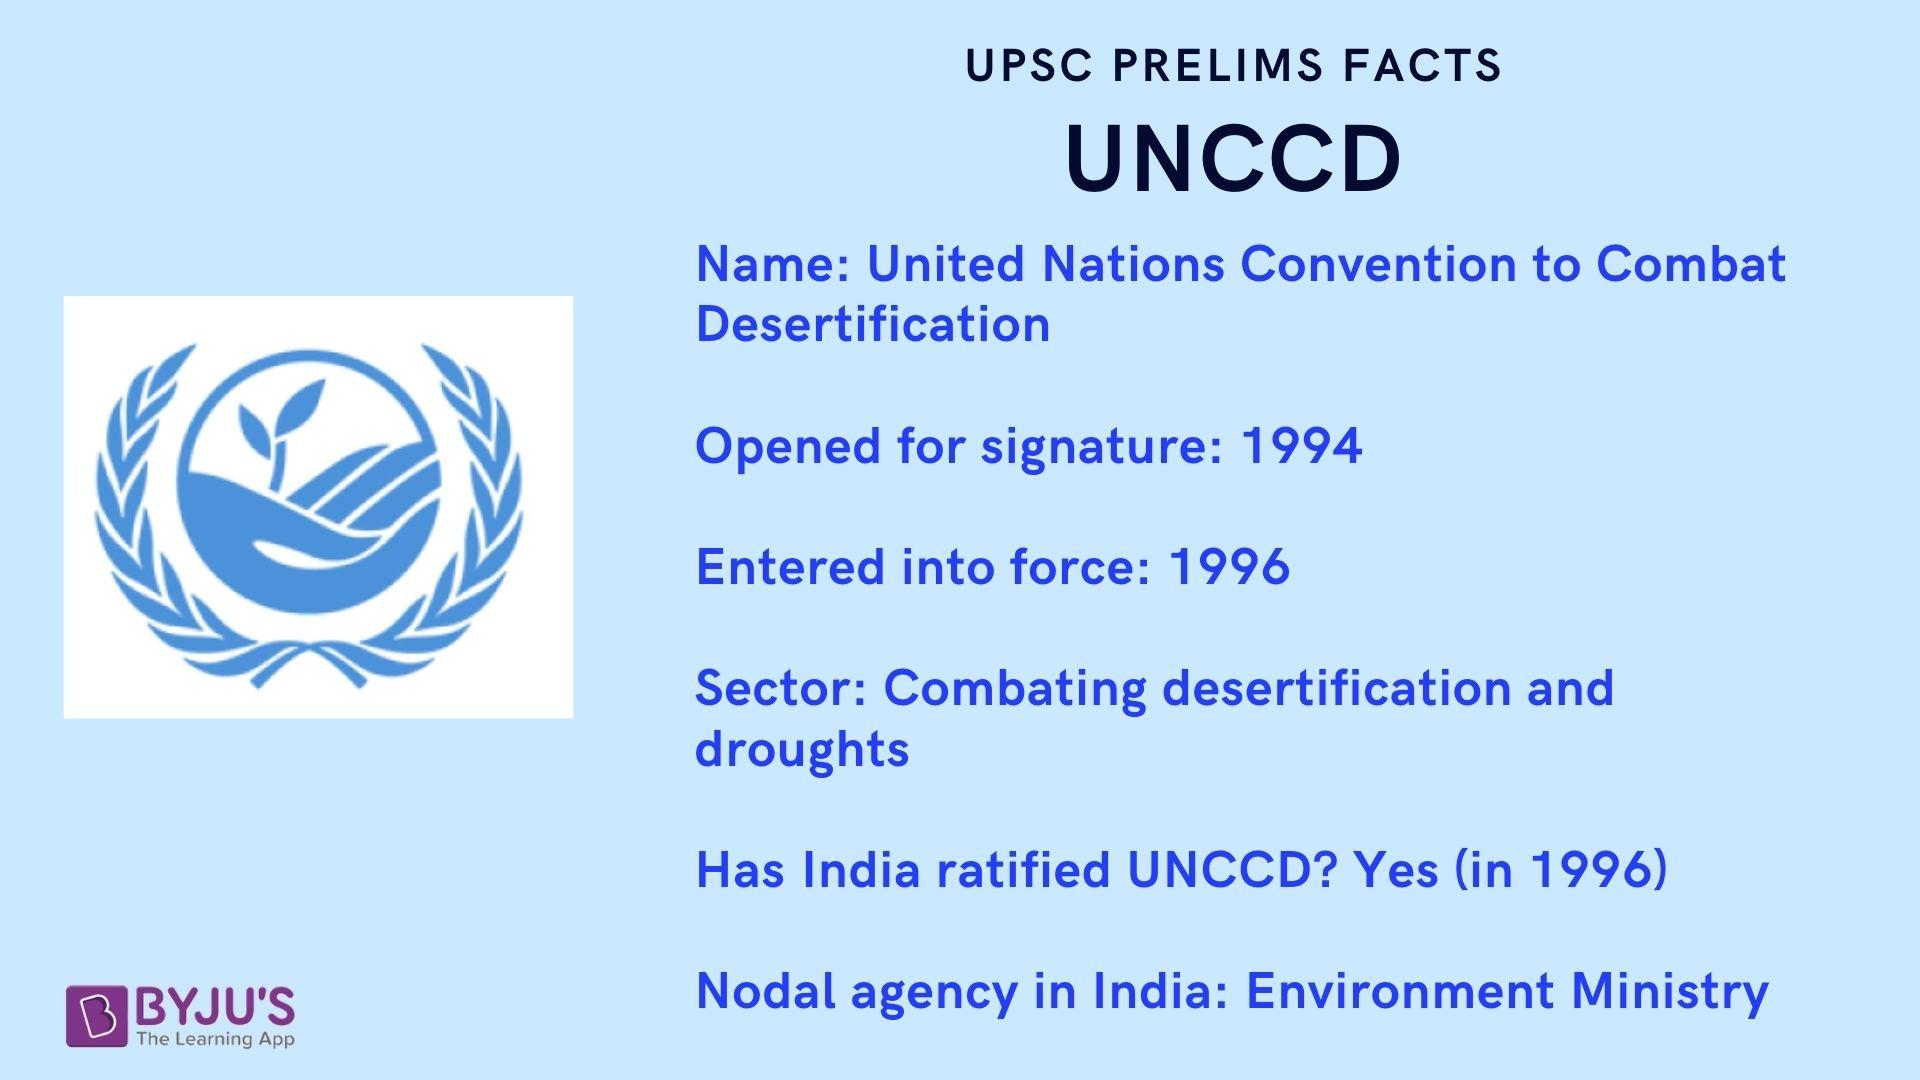 UPSC PRELIMS FACTS - UNCCD